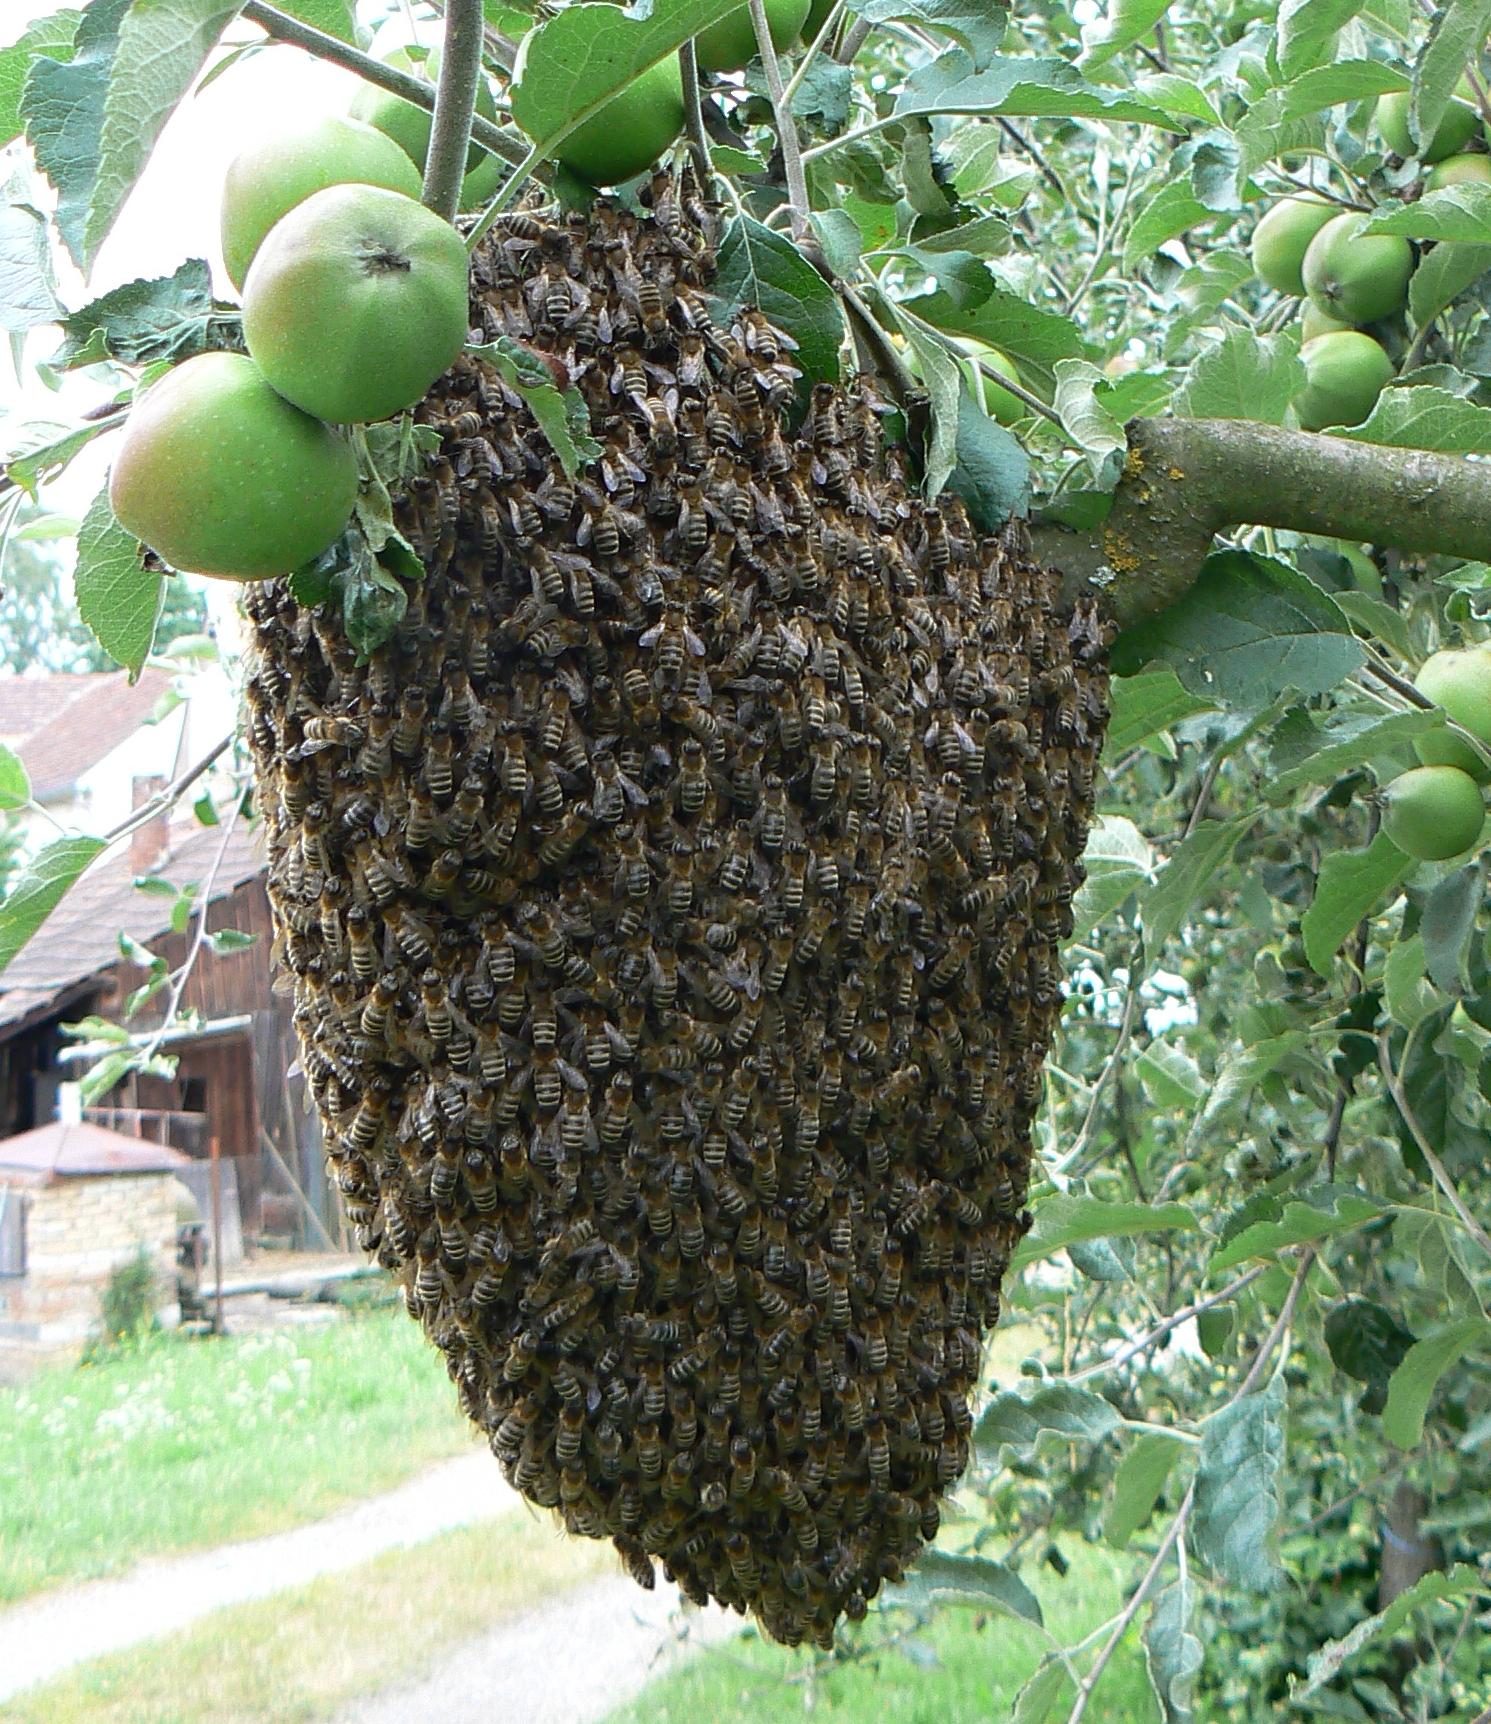 file apis mellifera swarm in czech wikimedia commons. Black Bedroom Furniture Sets. Home Design Ideas